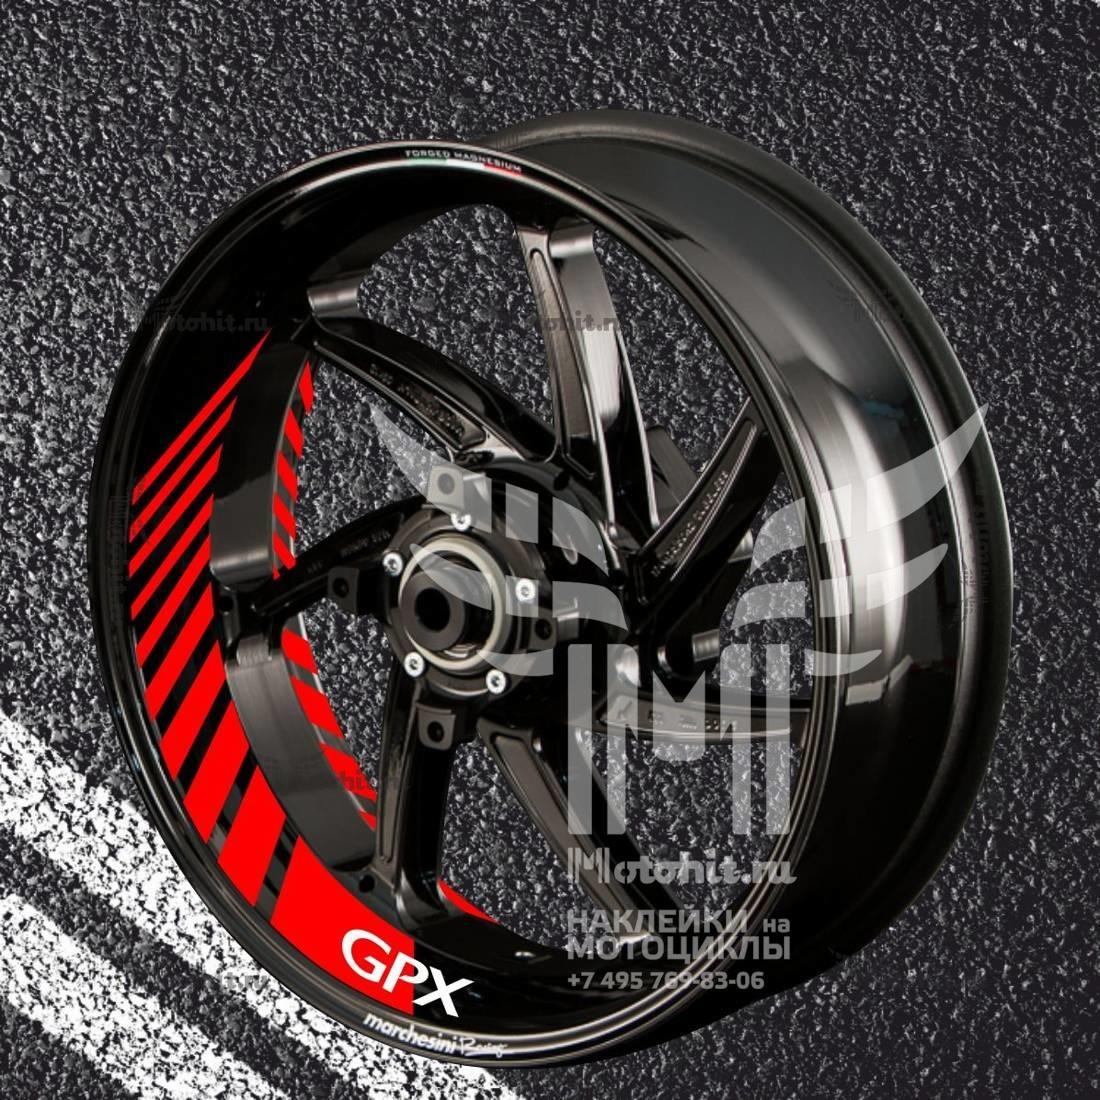 Комплект наклеек с полосами на колеса мотоцикла KAWASAKI GPX